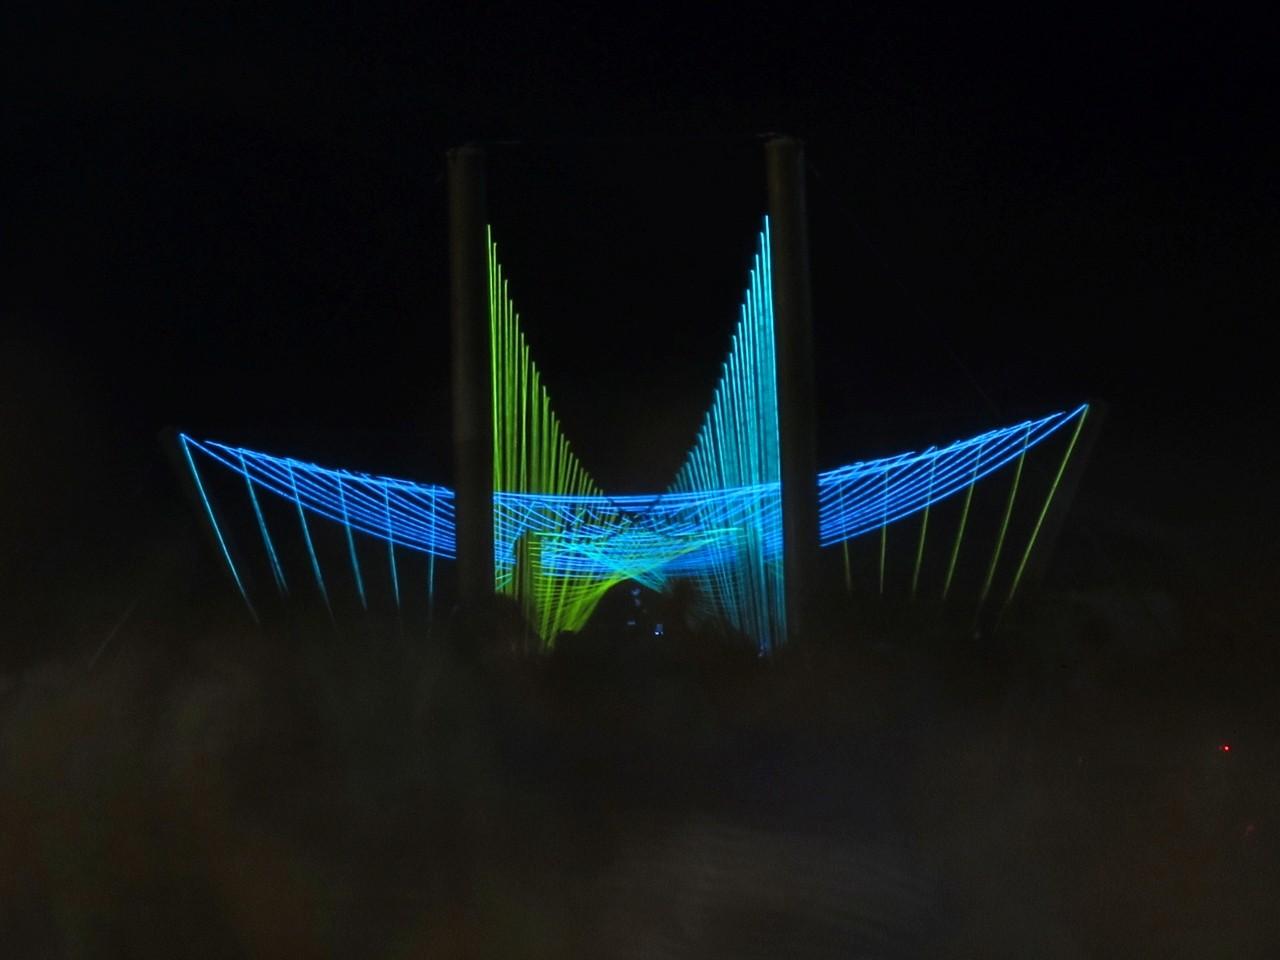 Luminous Passage / Predock Frane Architects, © Ian Thomas